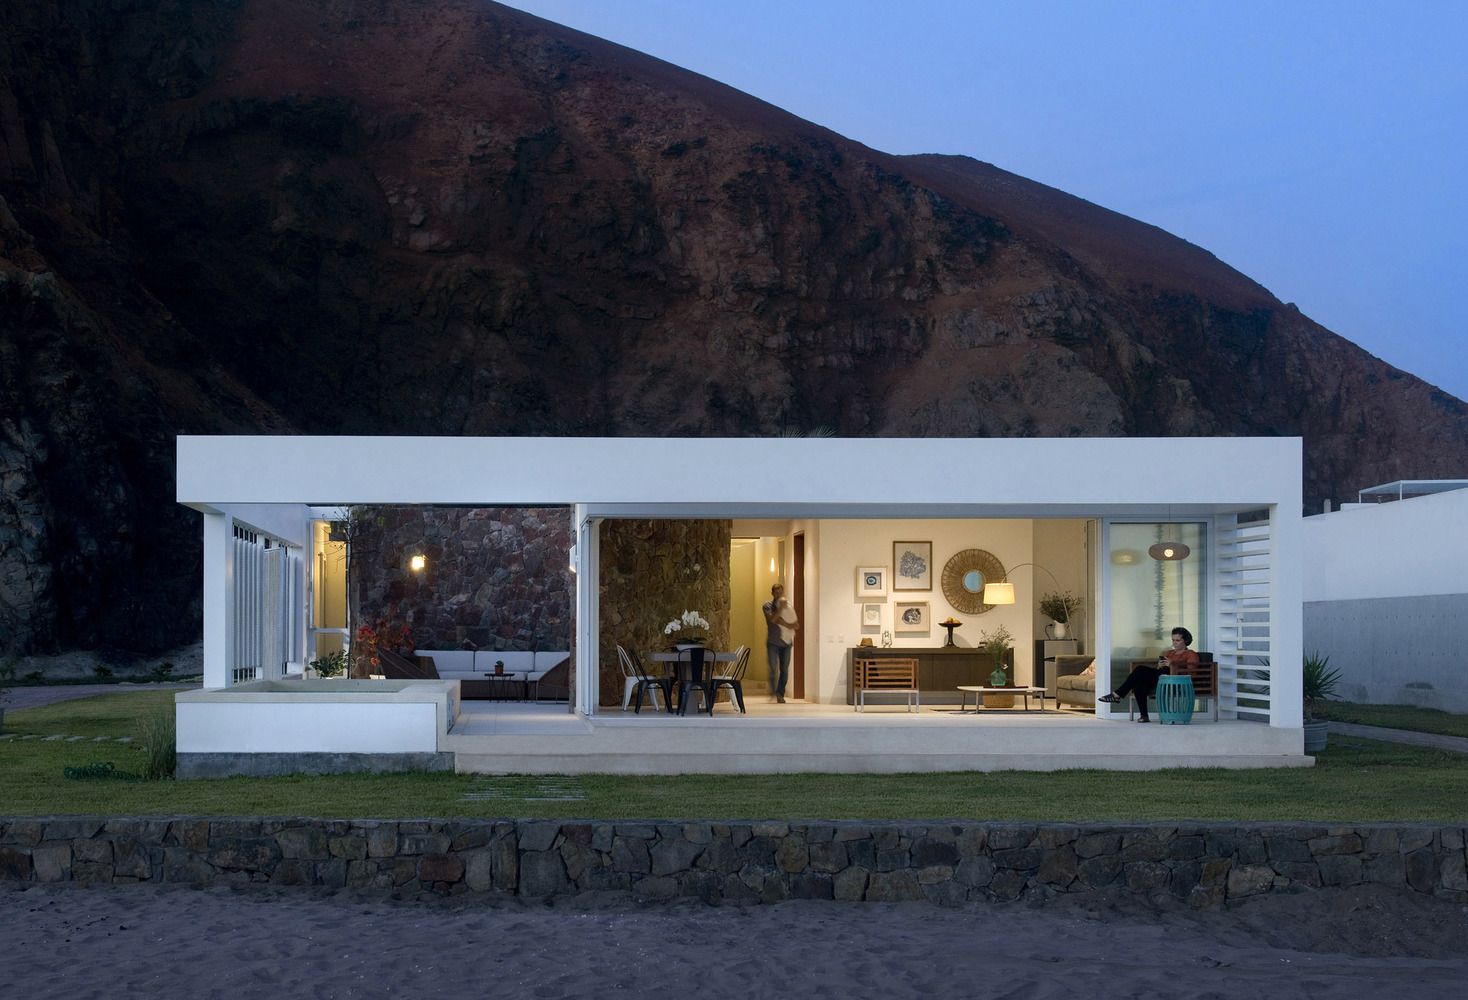 1_Ronda House_Marina Vella Arquitectura Urbanismo_Inspirationist